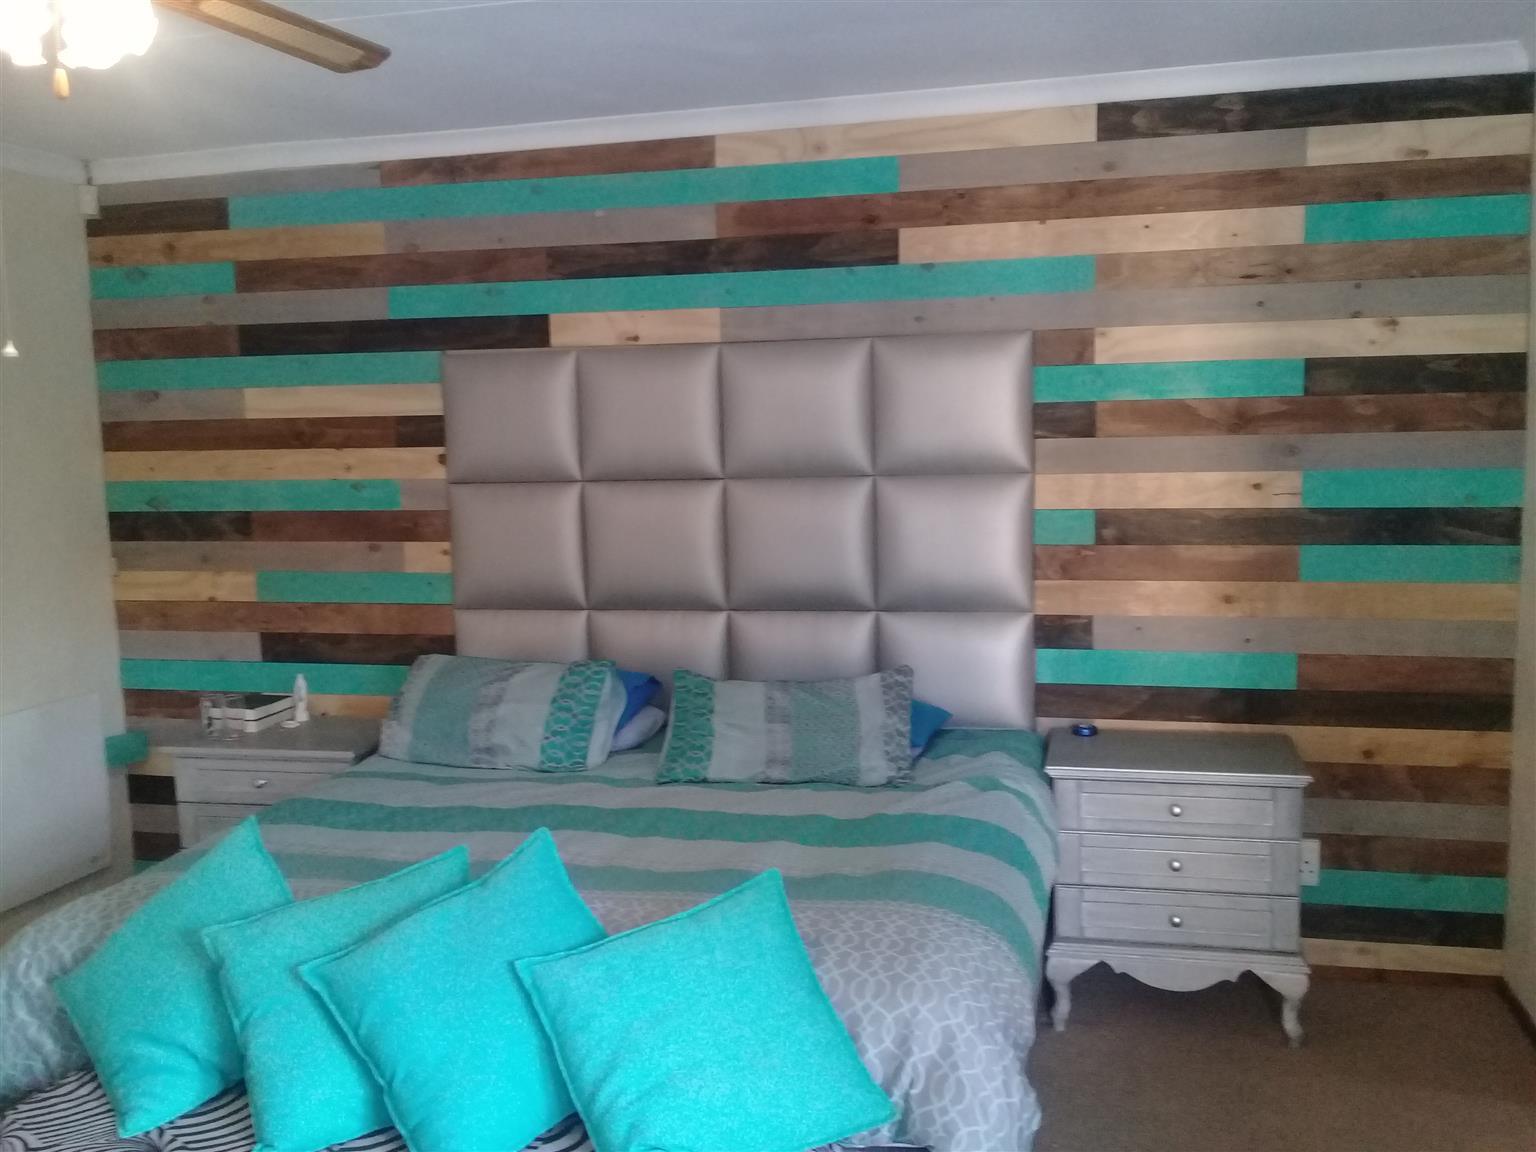 Wall Cladding, decoration & shelving